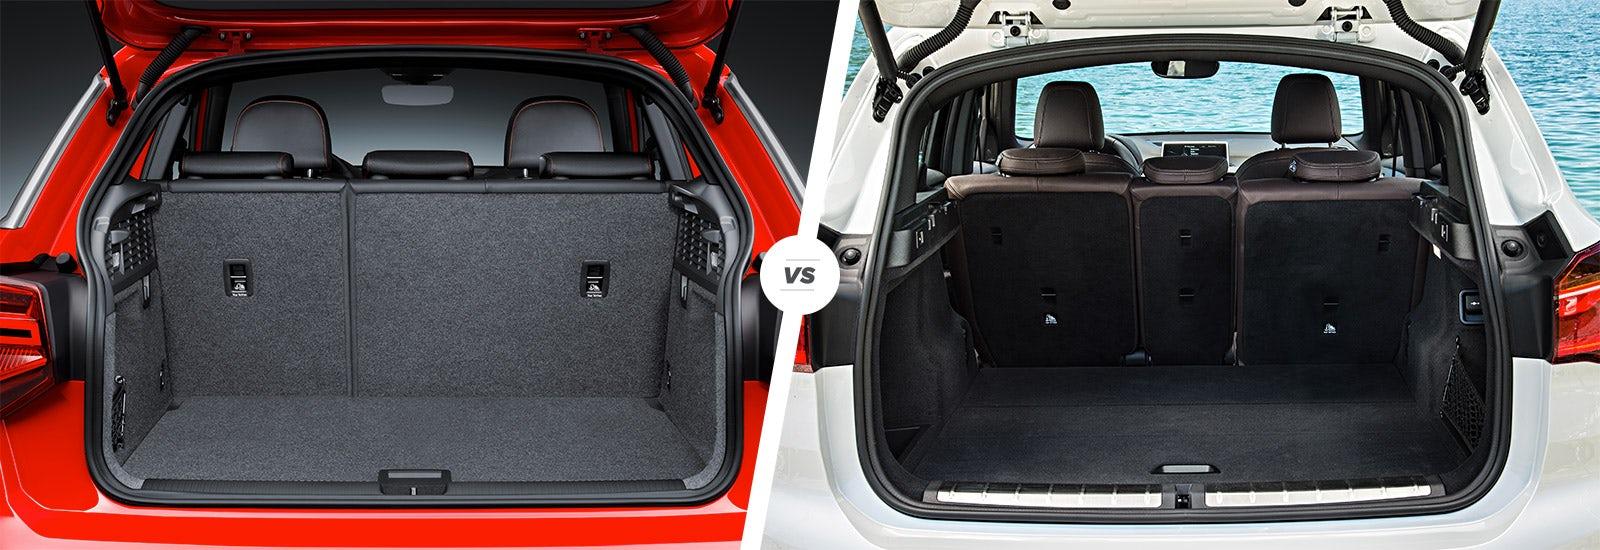 Audi Q2 Vs Bmw X1 Compact Suv Comparison Carwow